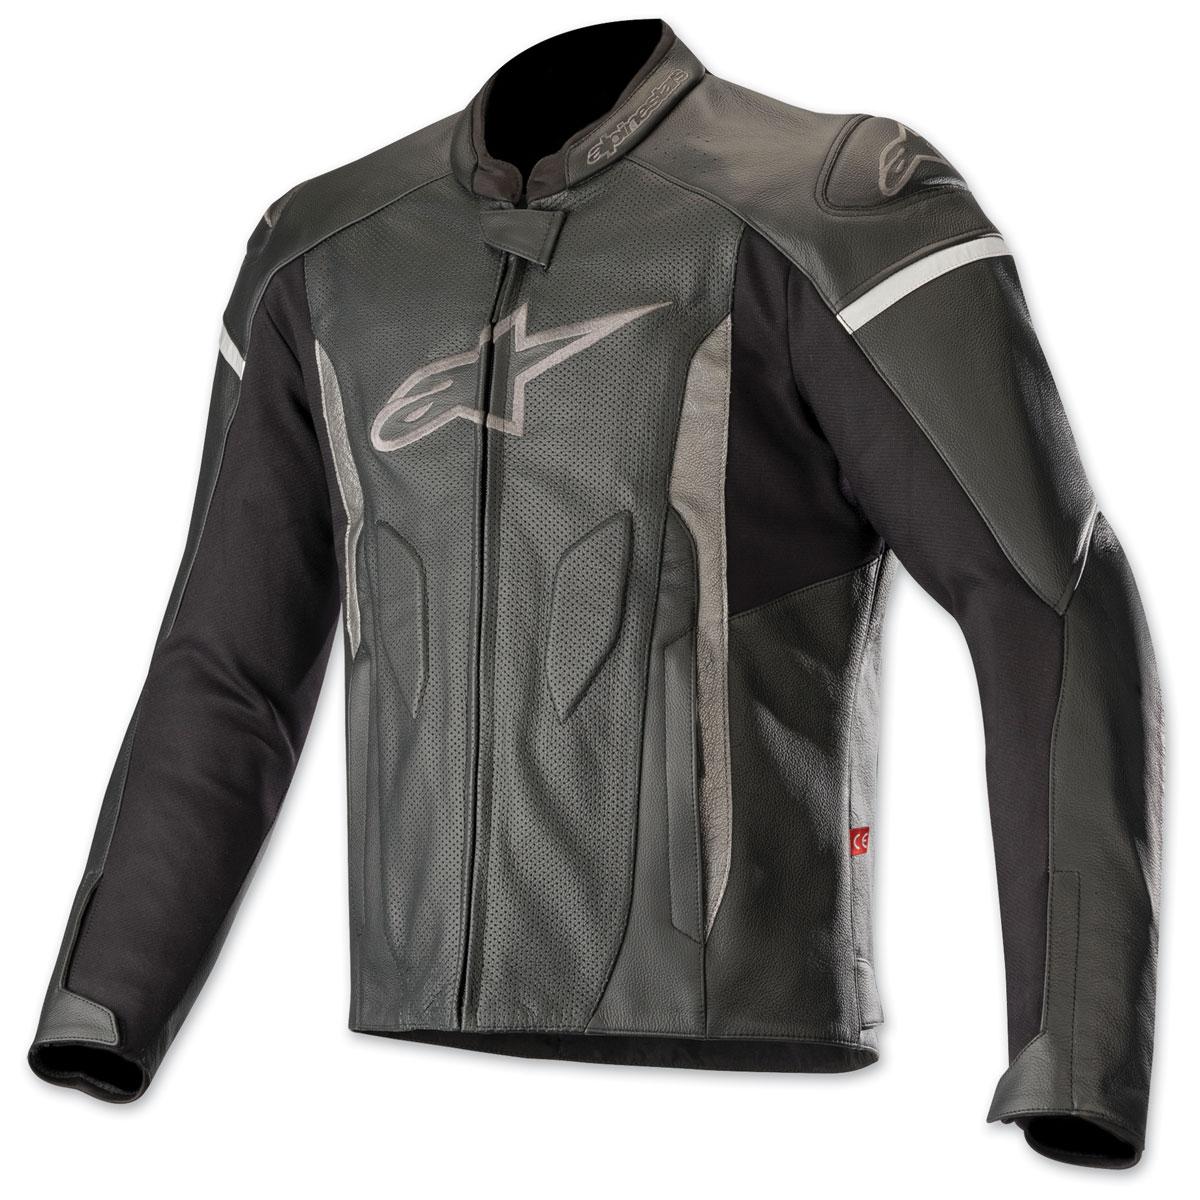 Alpinestars Men's Faster Airflow Black/Black Leather Jacket